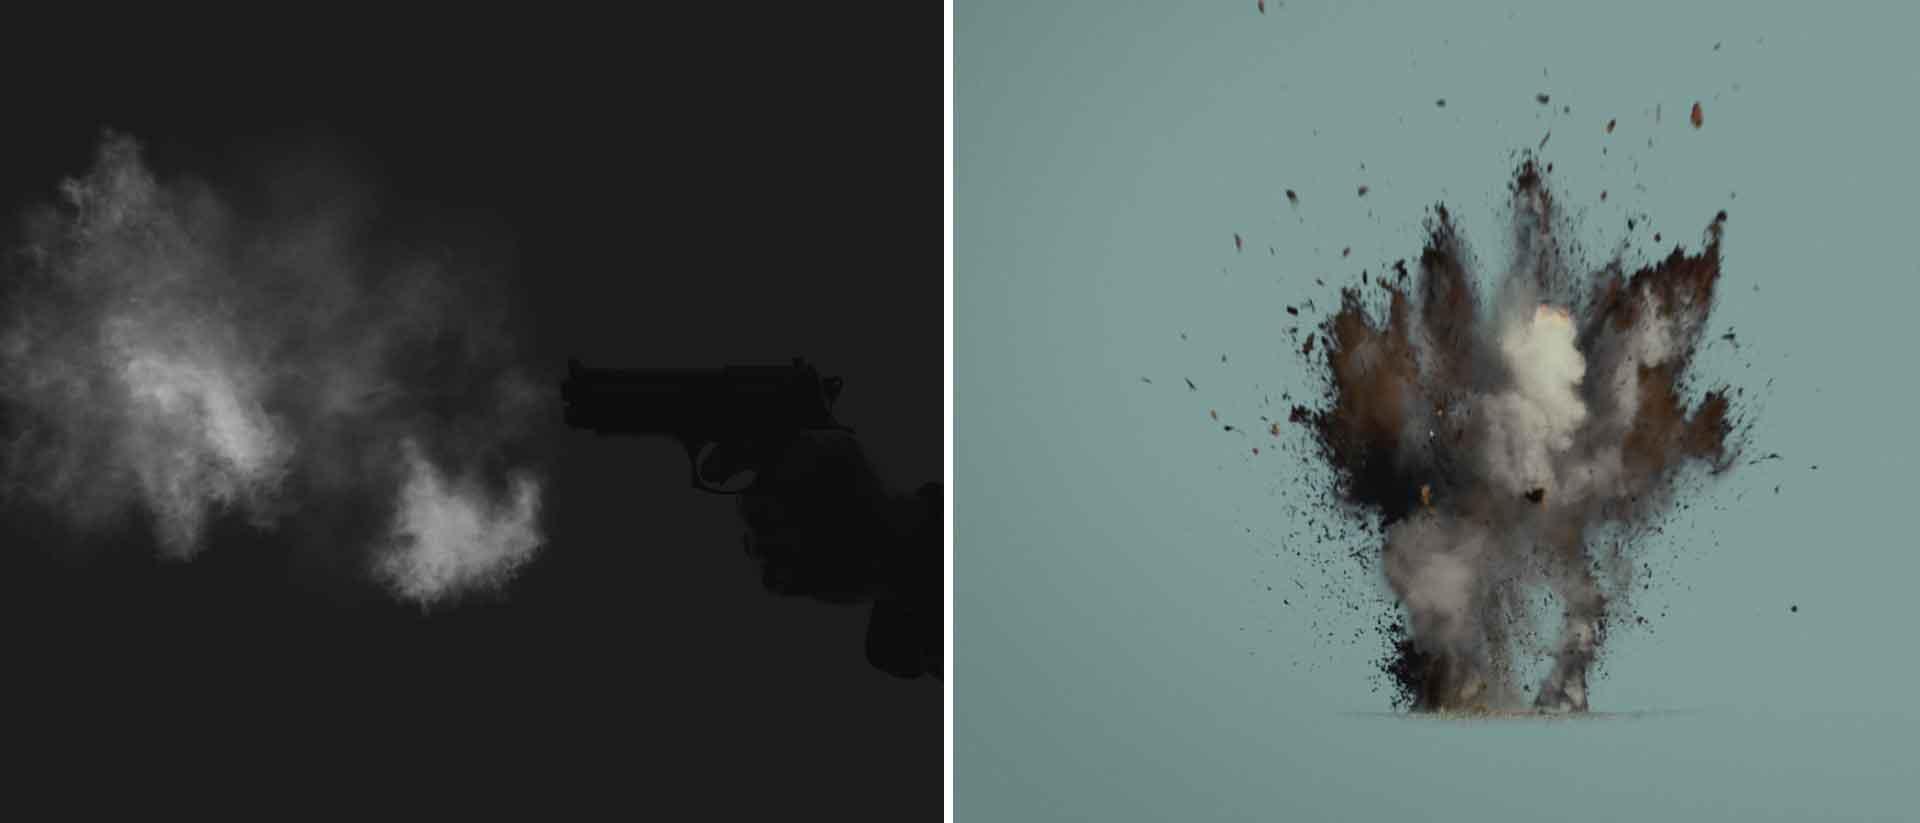 Gun smoke and dirt blasts banner v2